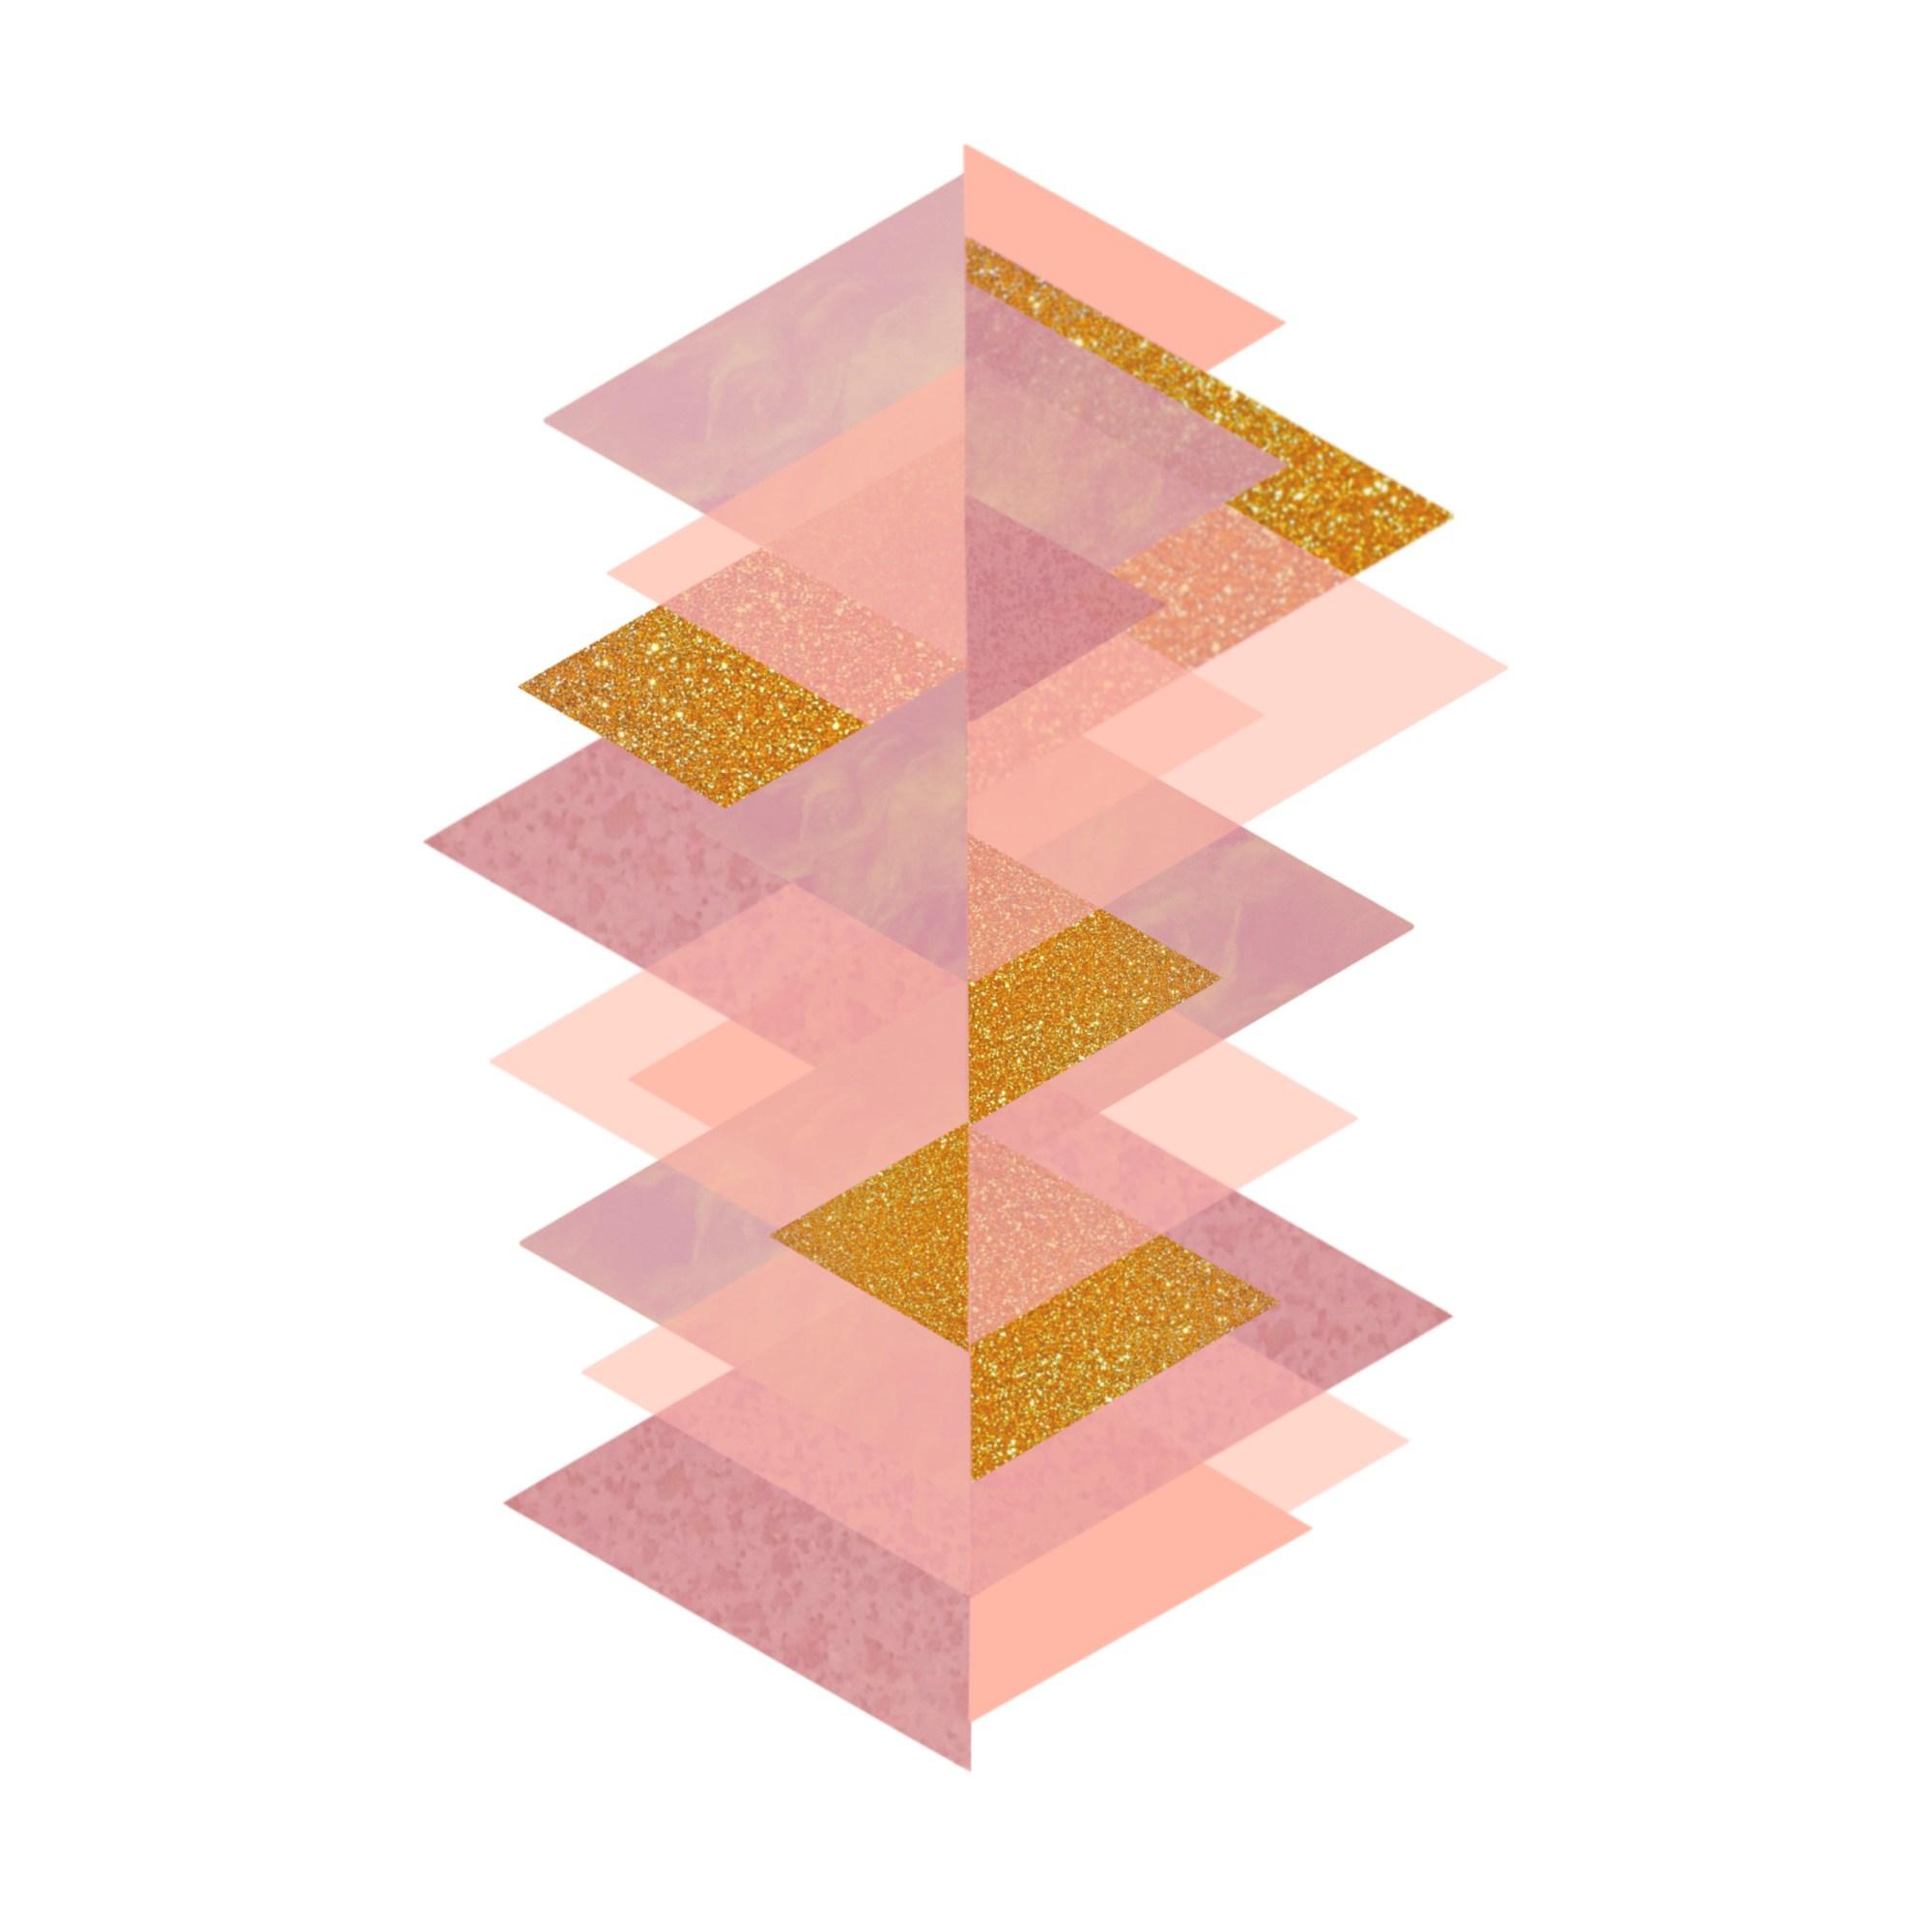 Prismatic No. 2 - Rebecca Goodman